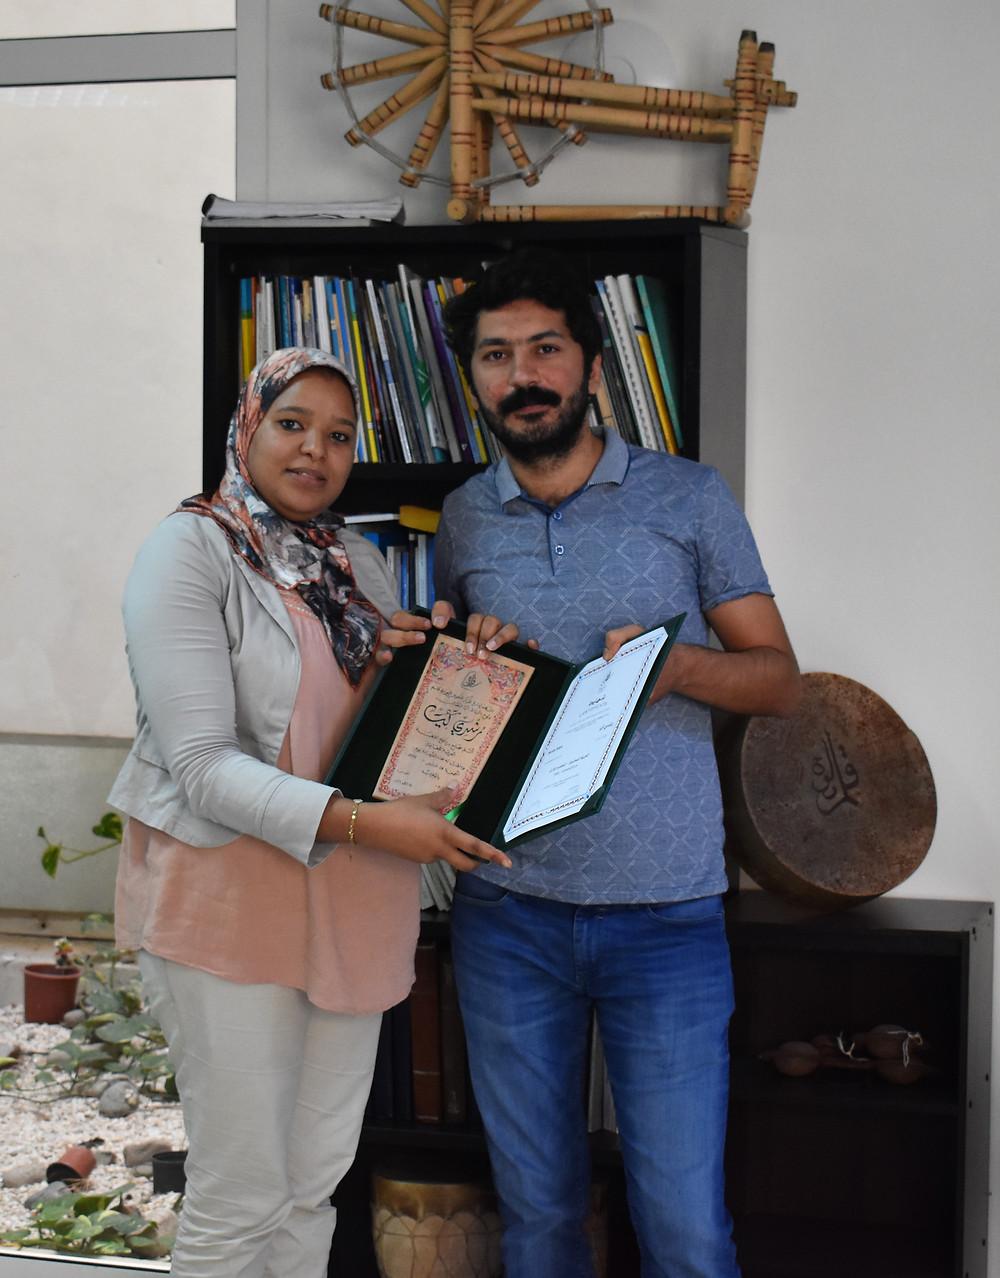 Arabic student receiving a certificate